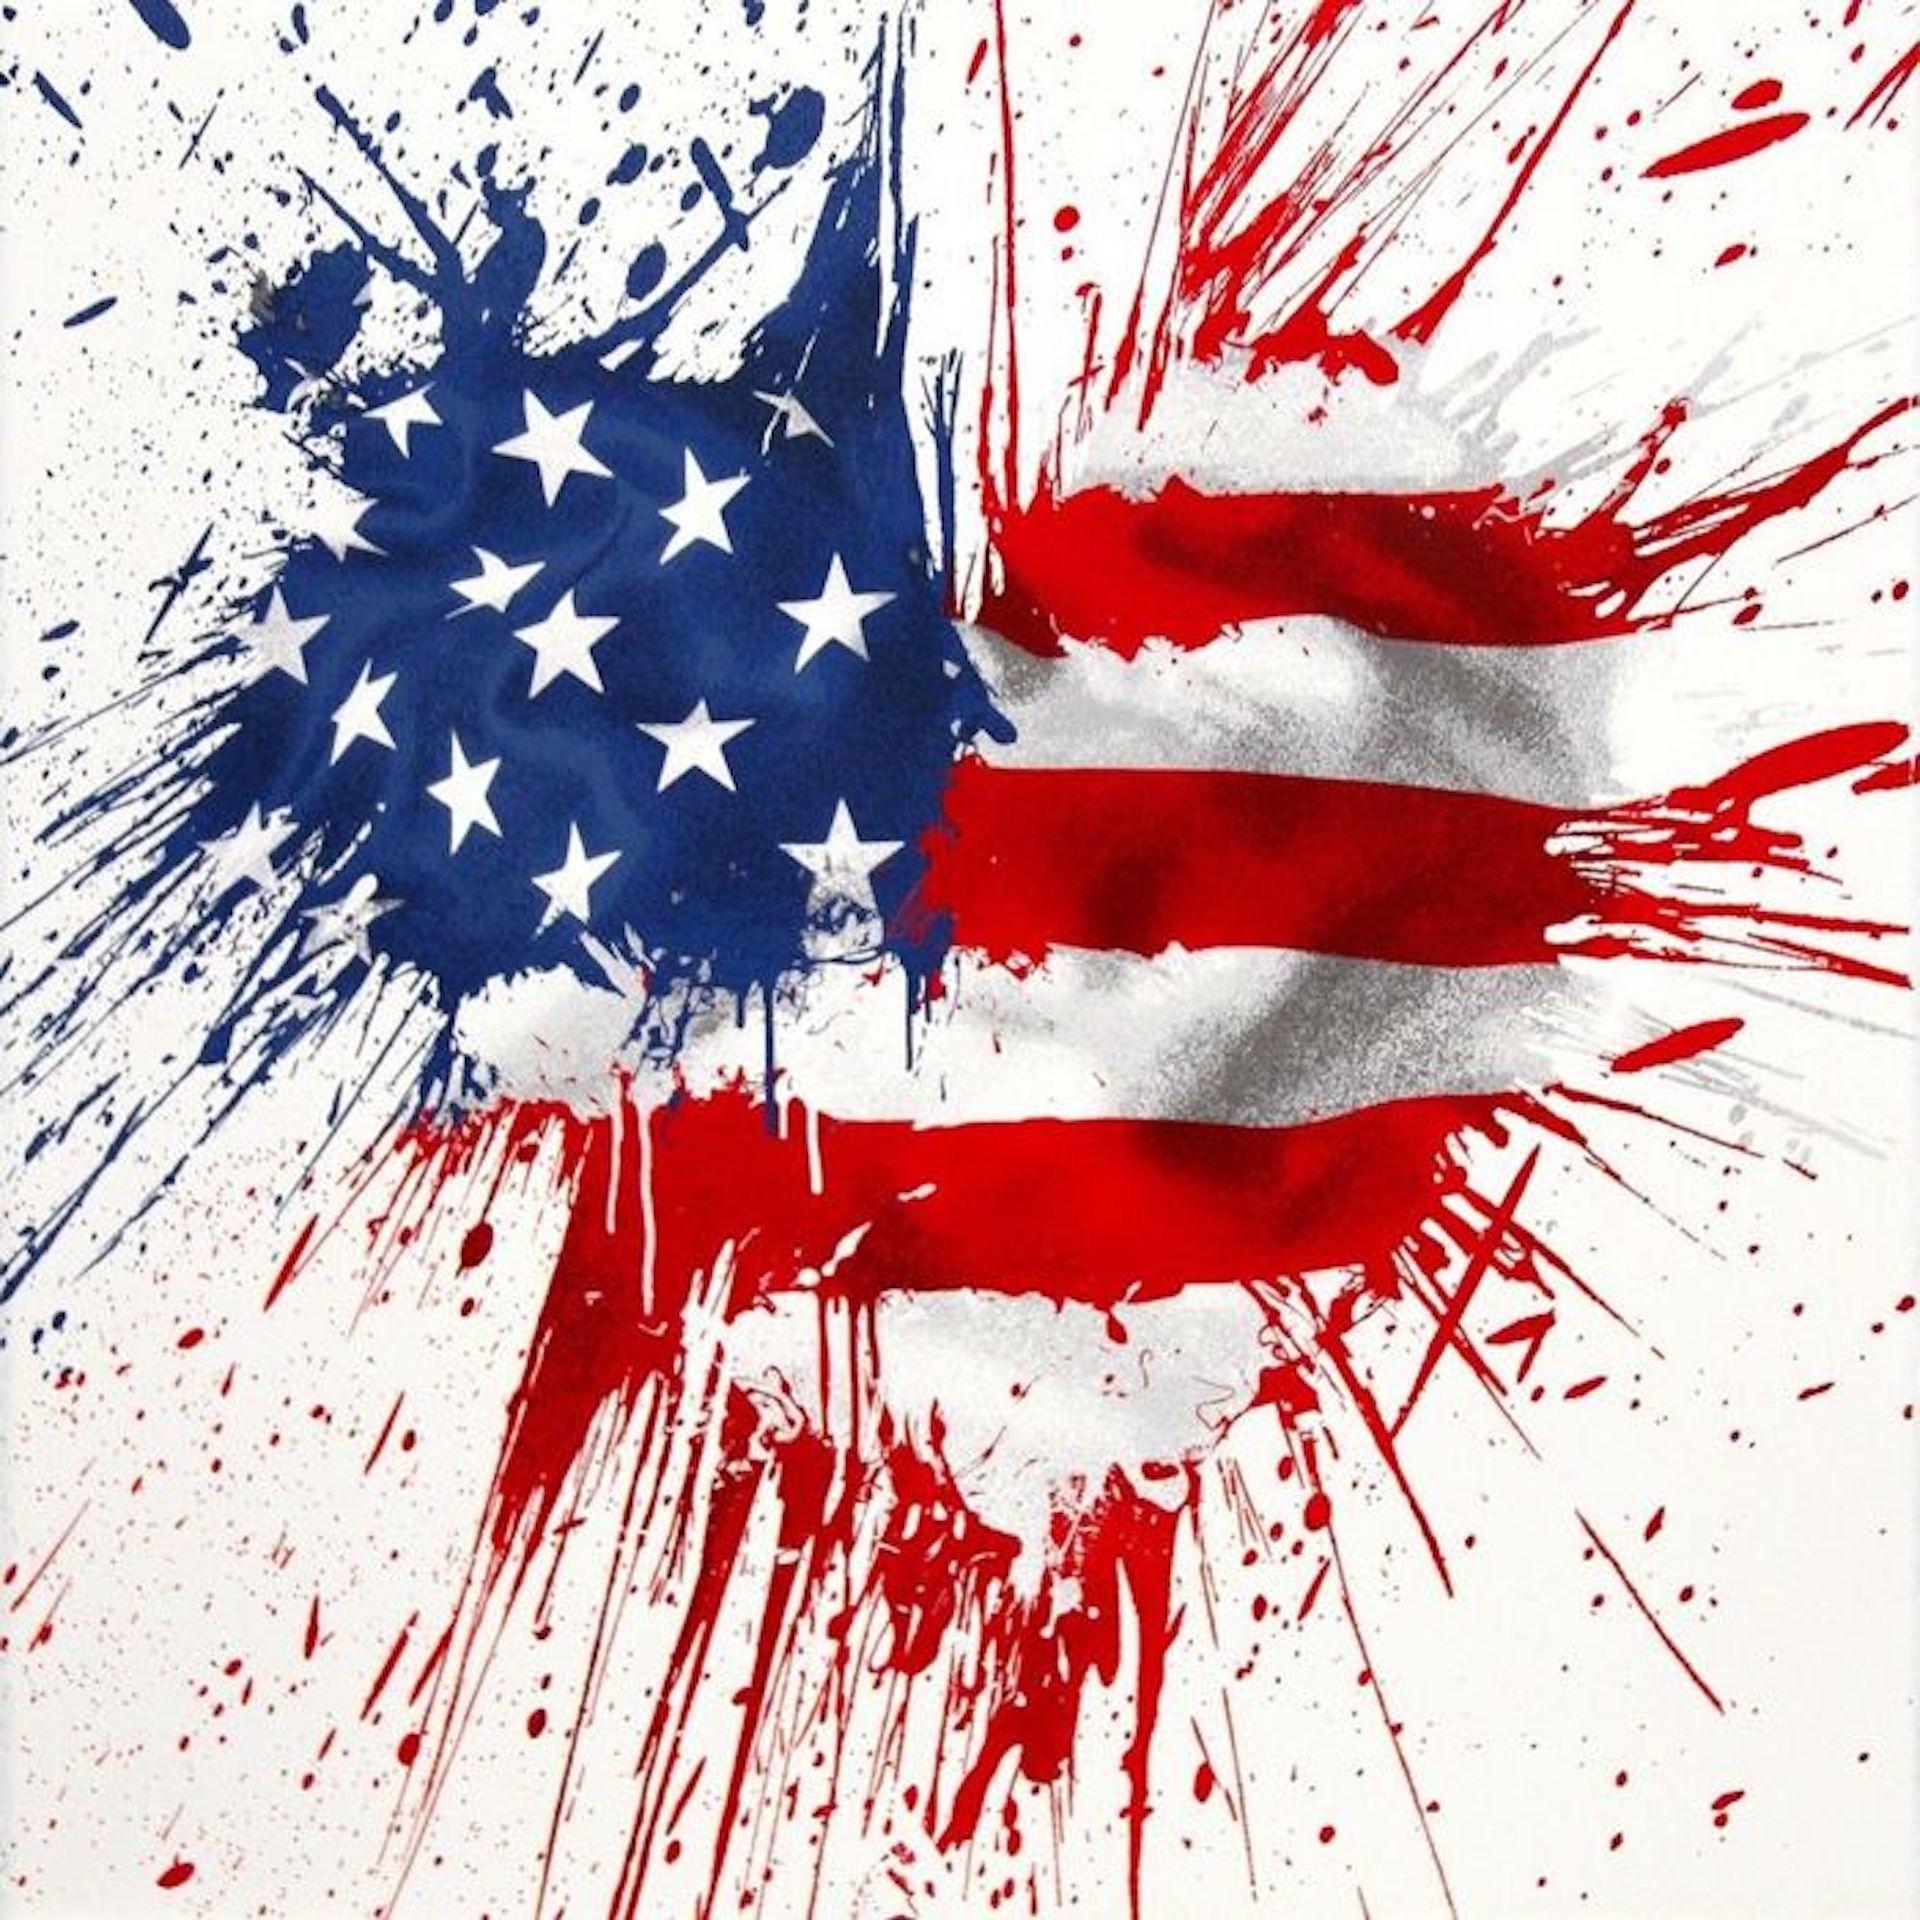 America is in the Heart by Mr. Brainwash